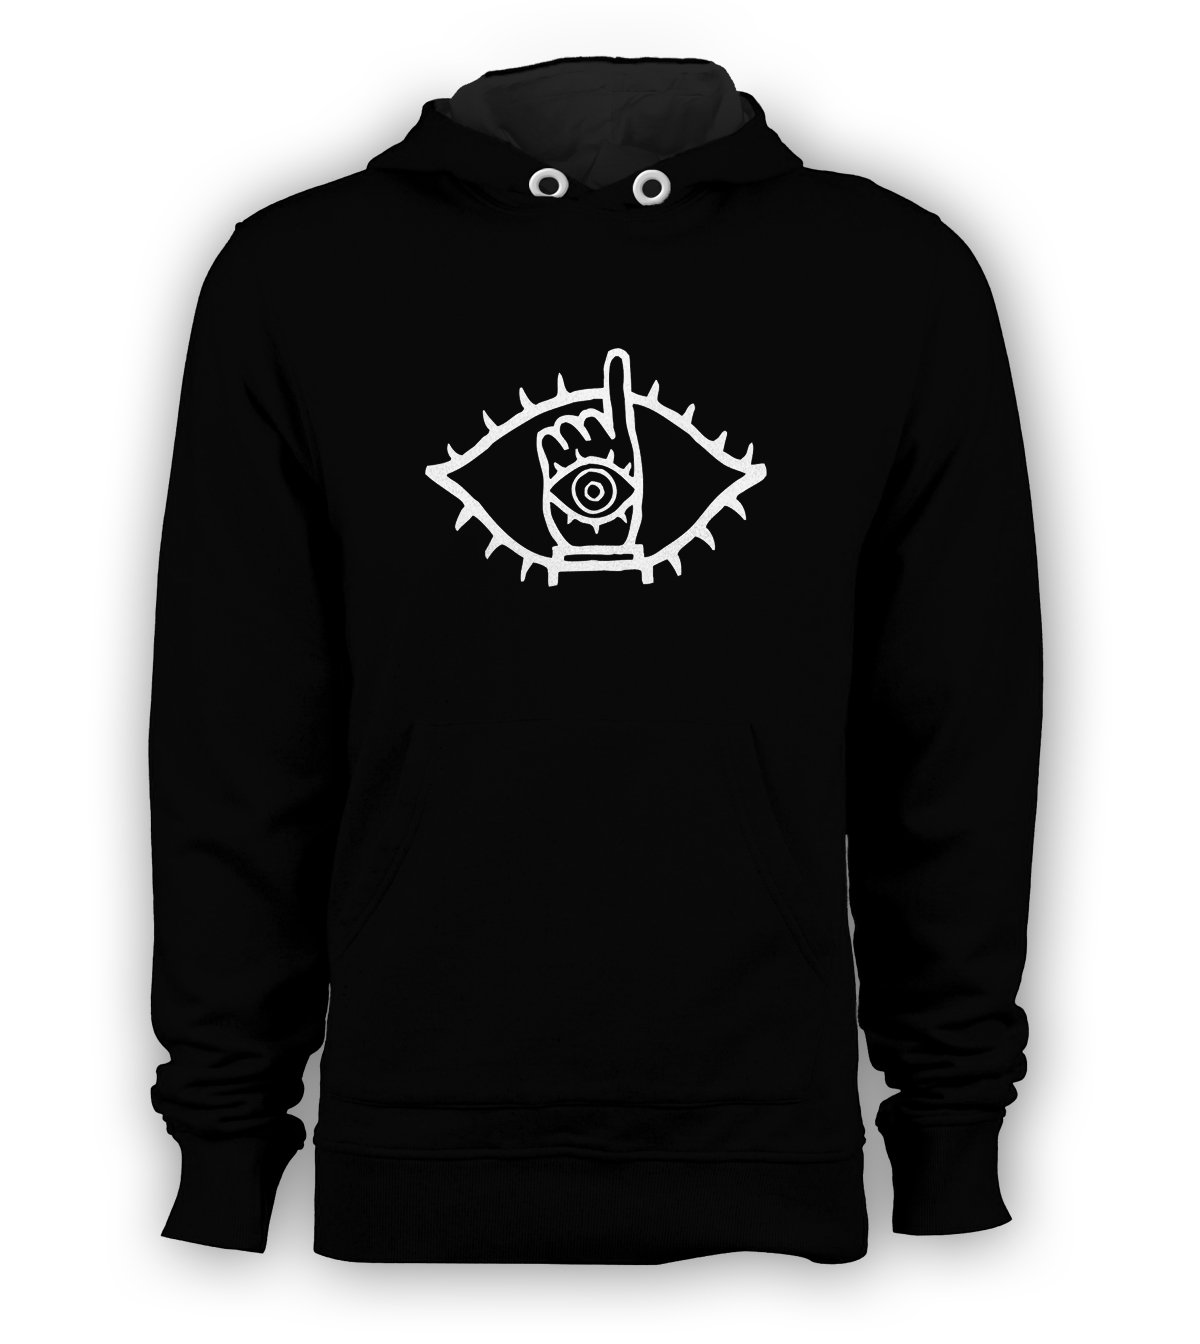 20th Century Boys Anime Manga Pullover Hoodie Men Sweatshirts S to 3XL New Black